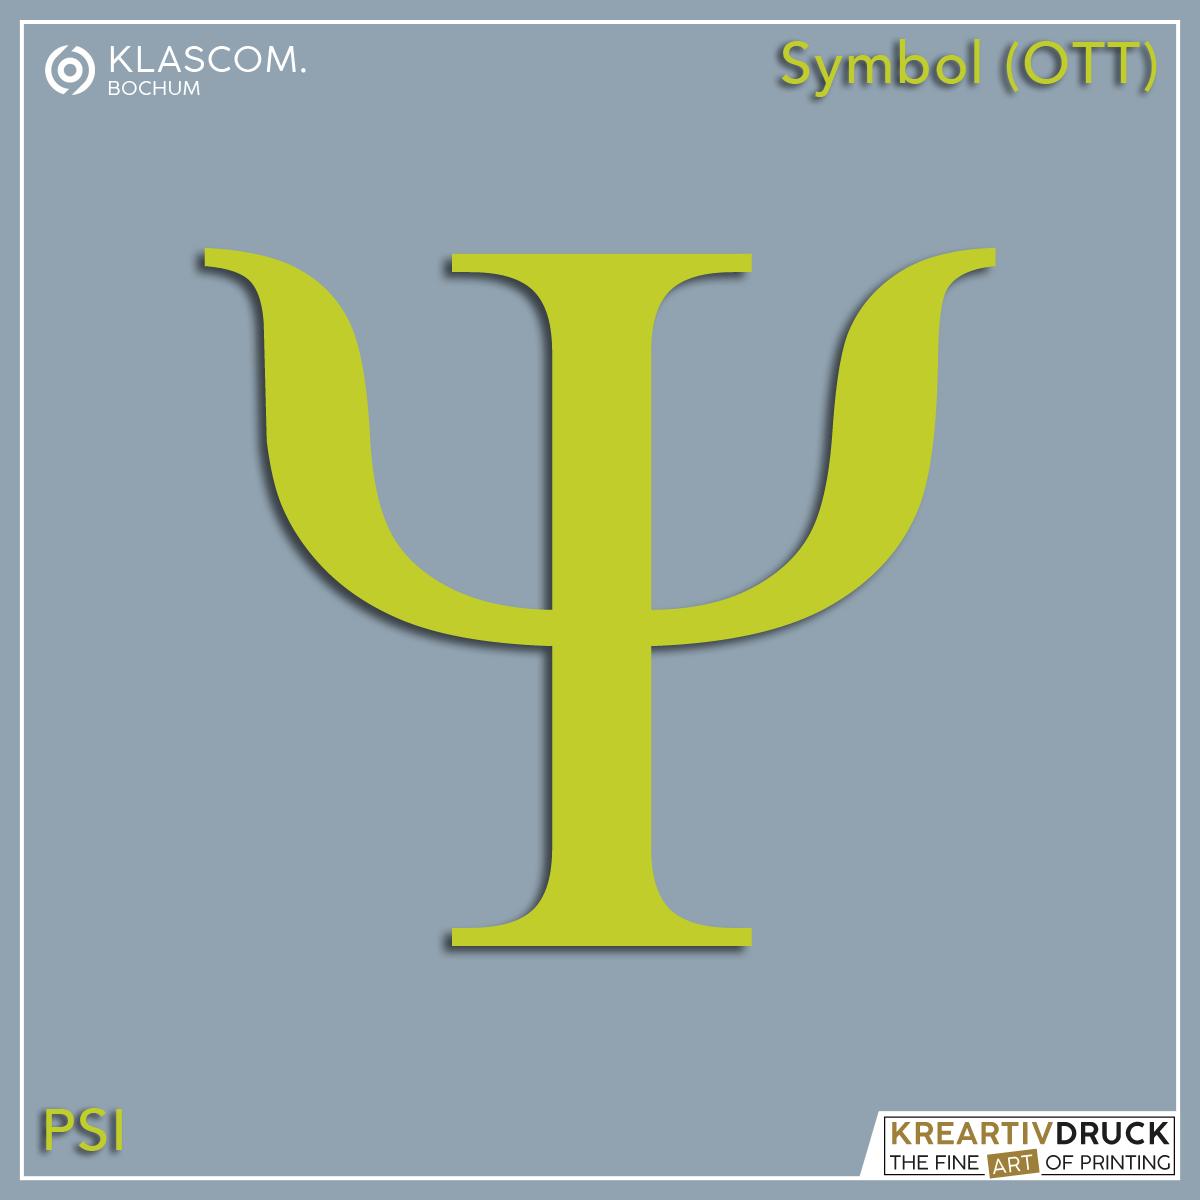 Symbol Psi in Wunschfarbe